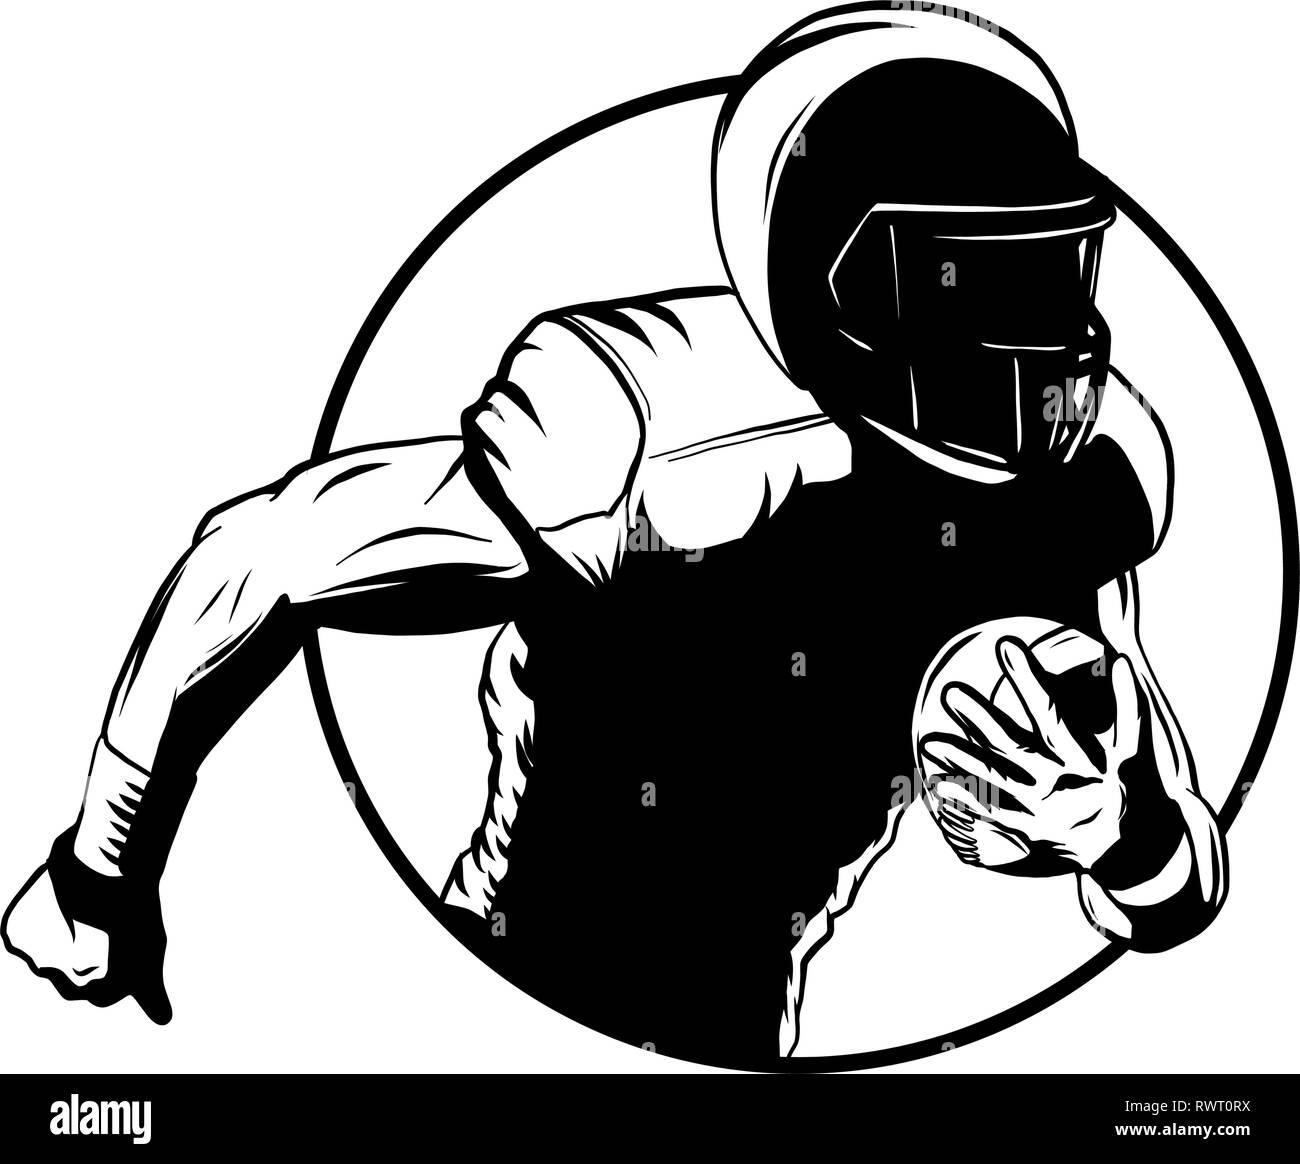 American football player. Super bowl sport theme vector illustration. - Stock Image